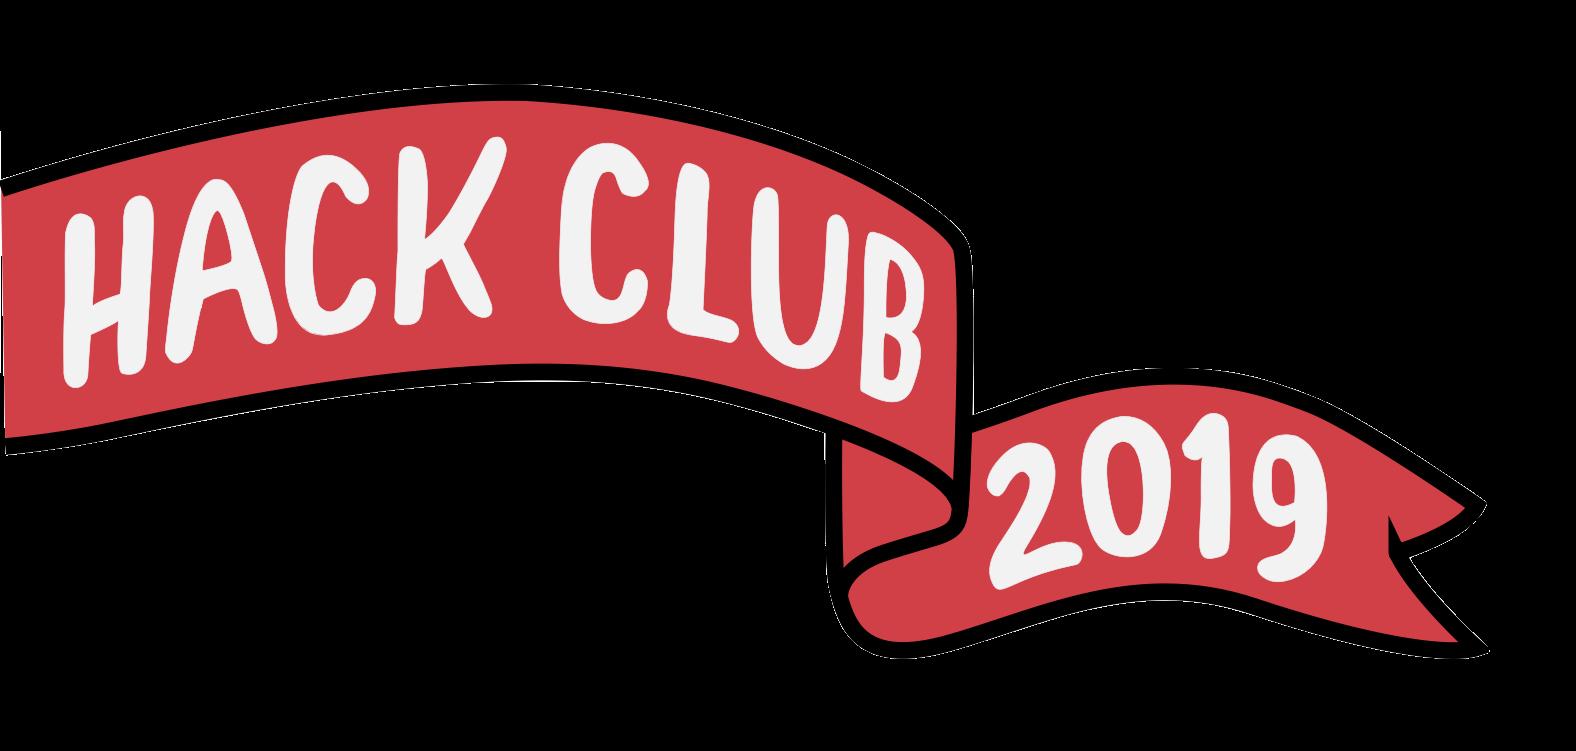 Hack Club banner